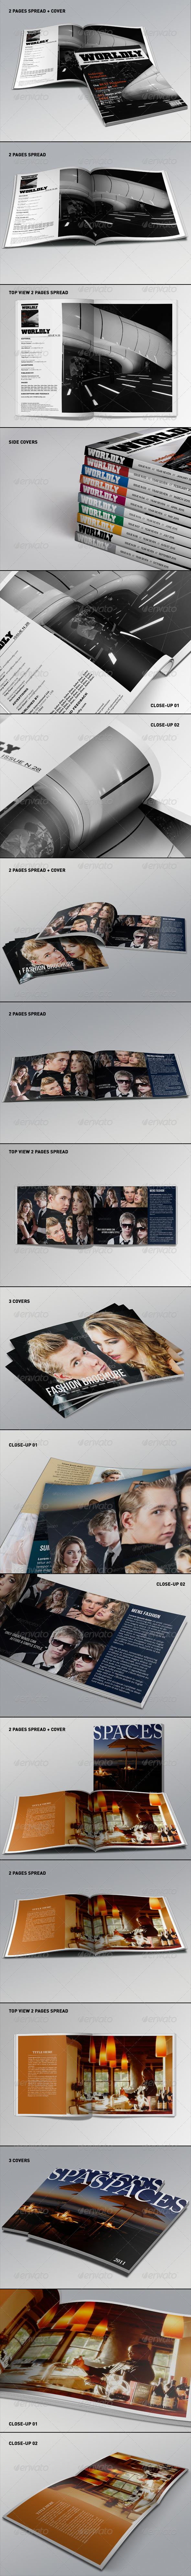 Realistic Magazine Mockups Bundle - Print Product Mock-Ups